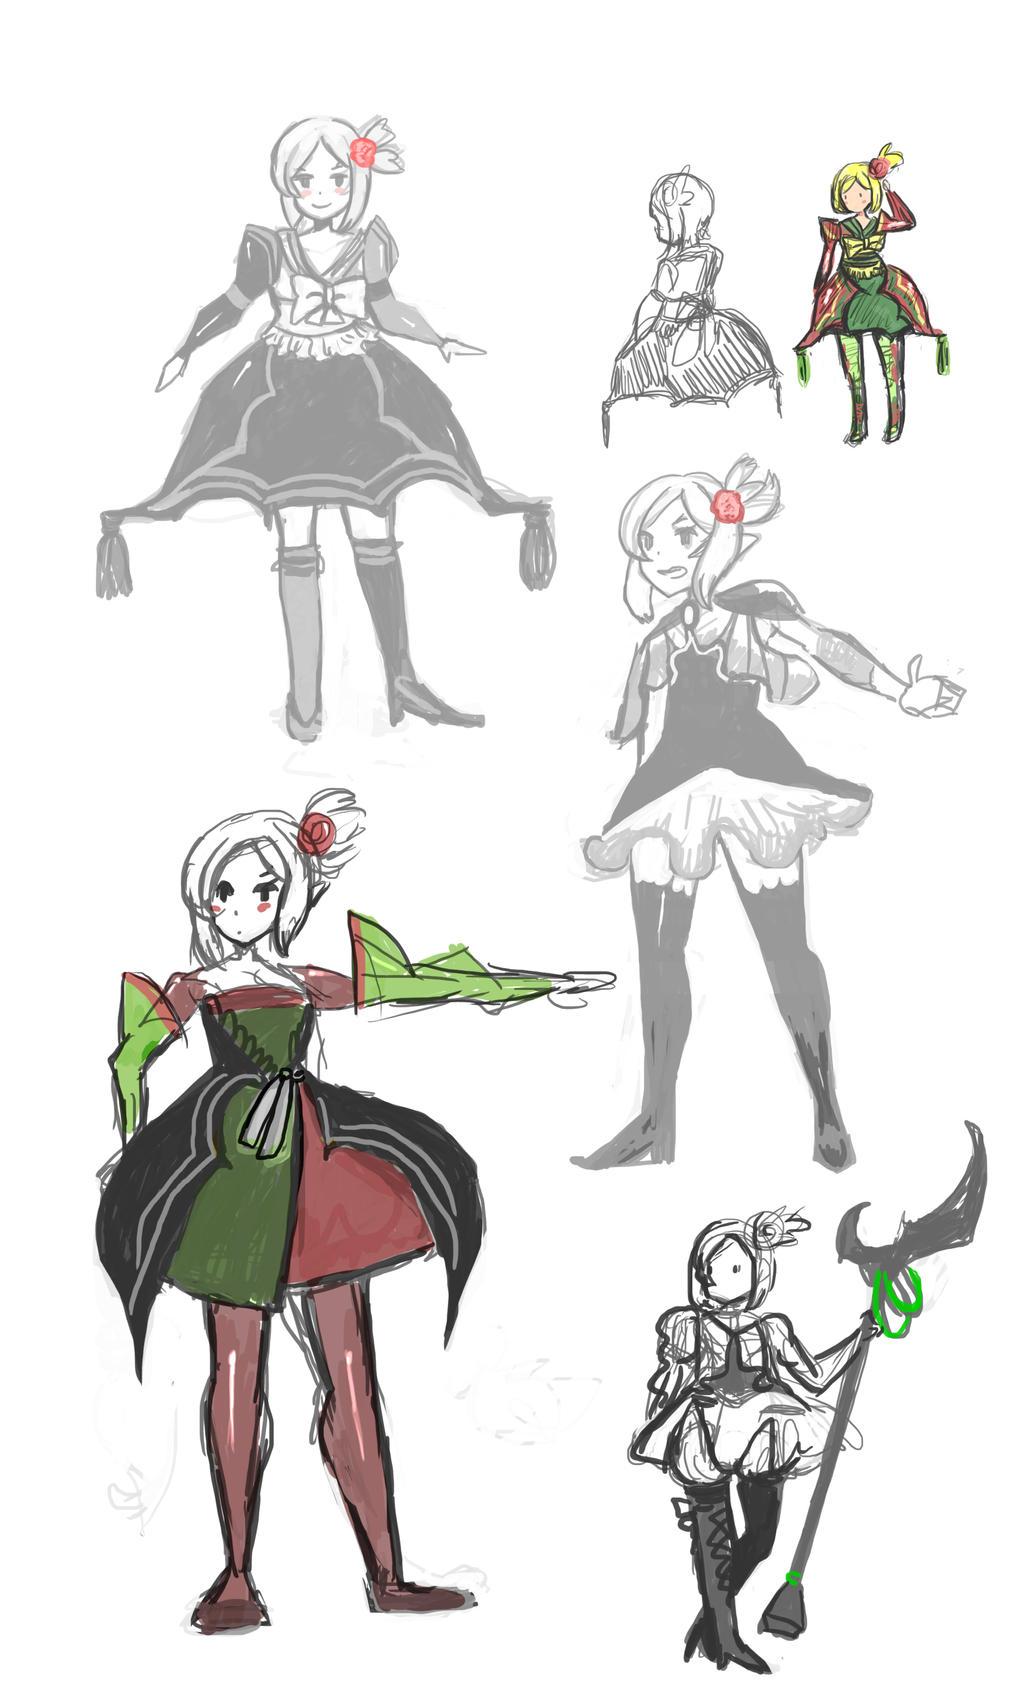 Artwork: Design clothes for Elwe Macaulaure by hiromihana